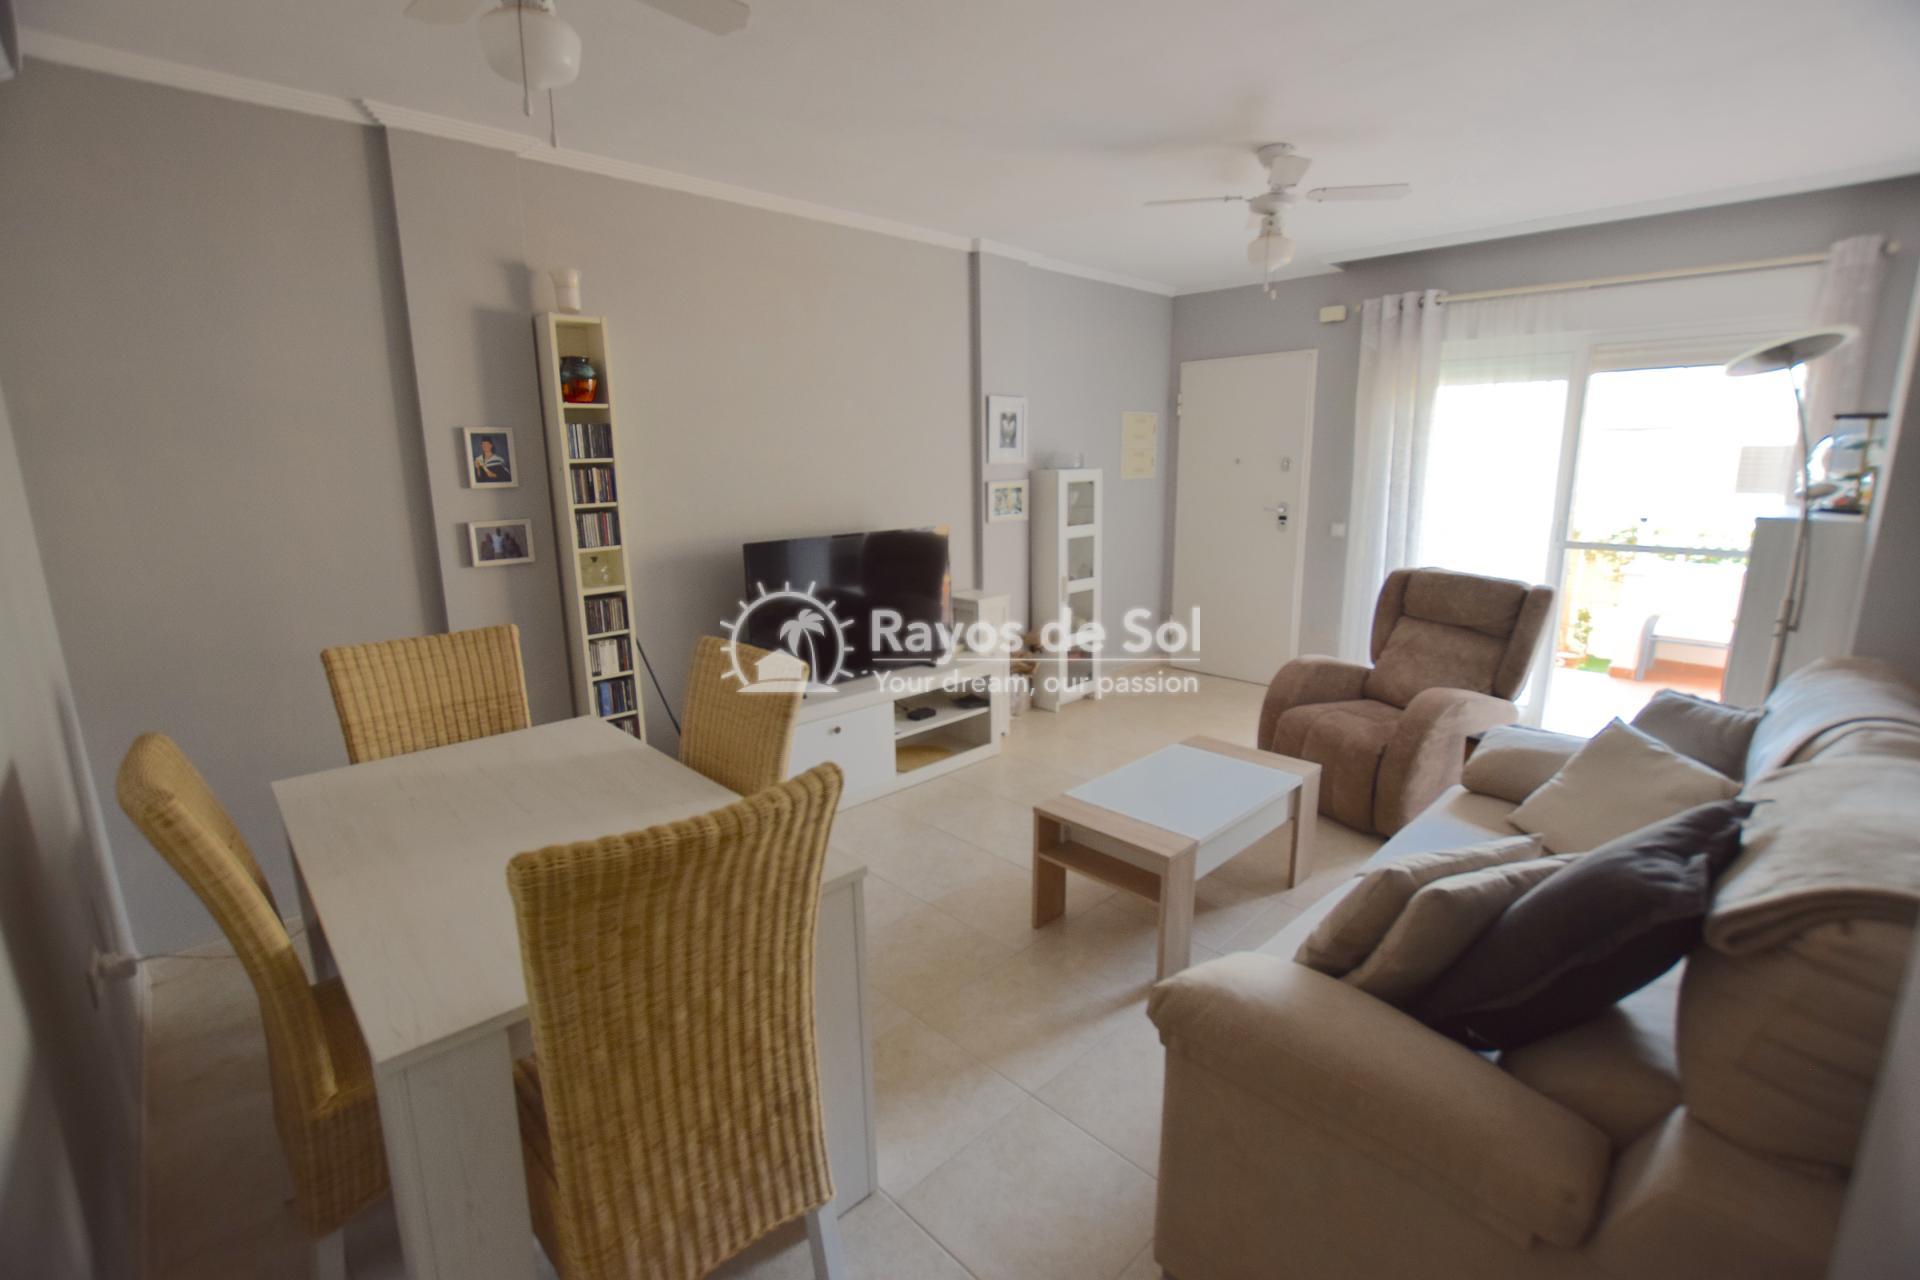 Appartement met zuidwest oriëntatie  in San Cayetano, Costa Cálida (SCRE0055) - 4